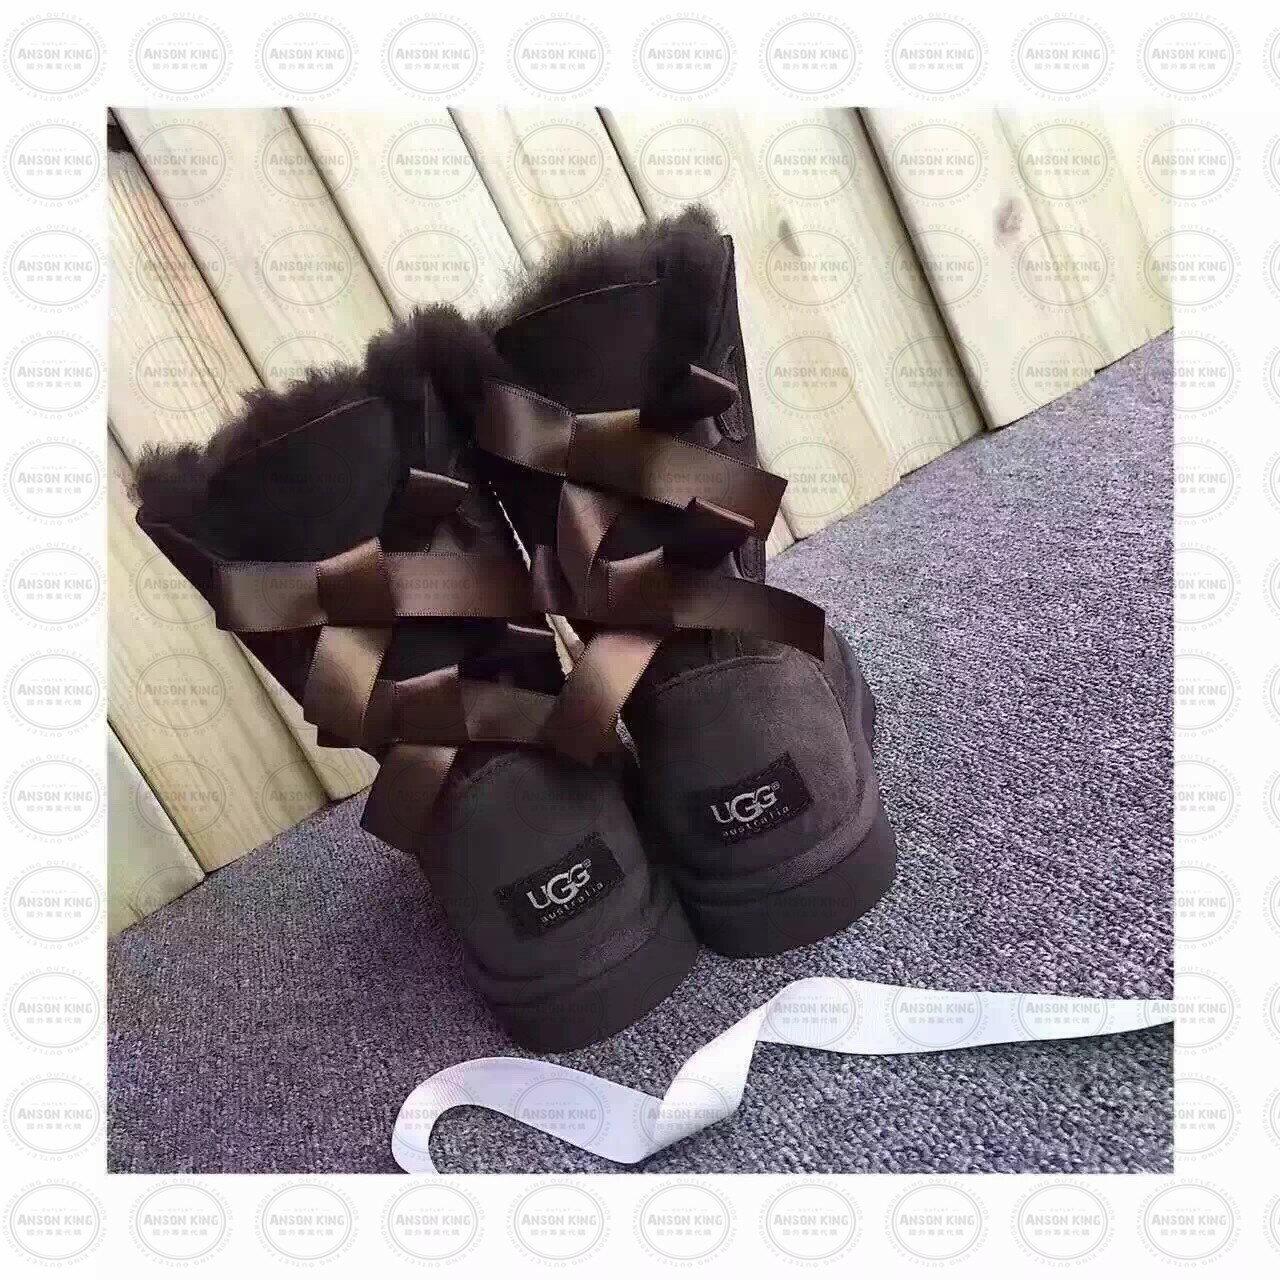 OUTLET正品代購 澳洲 UGG 蝴蝶結3280羊皮毛一體 中長靴 保暖 真皮羊皮毛 雪靴 短靴 深褐色 0